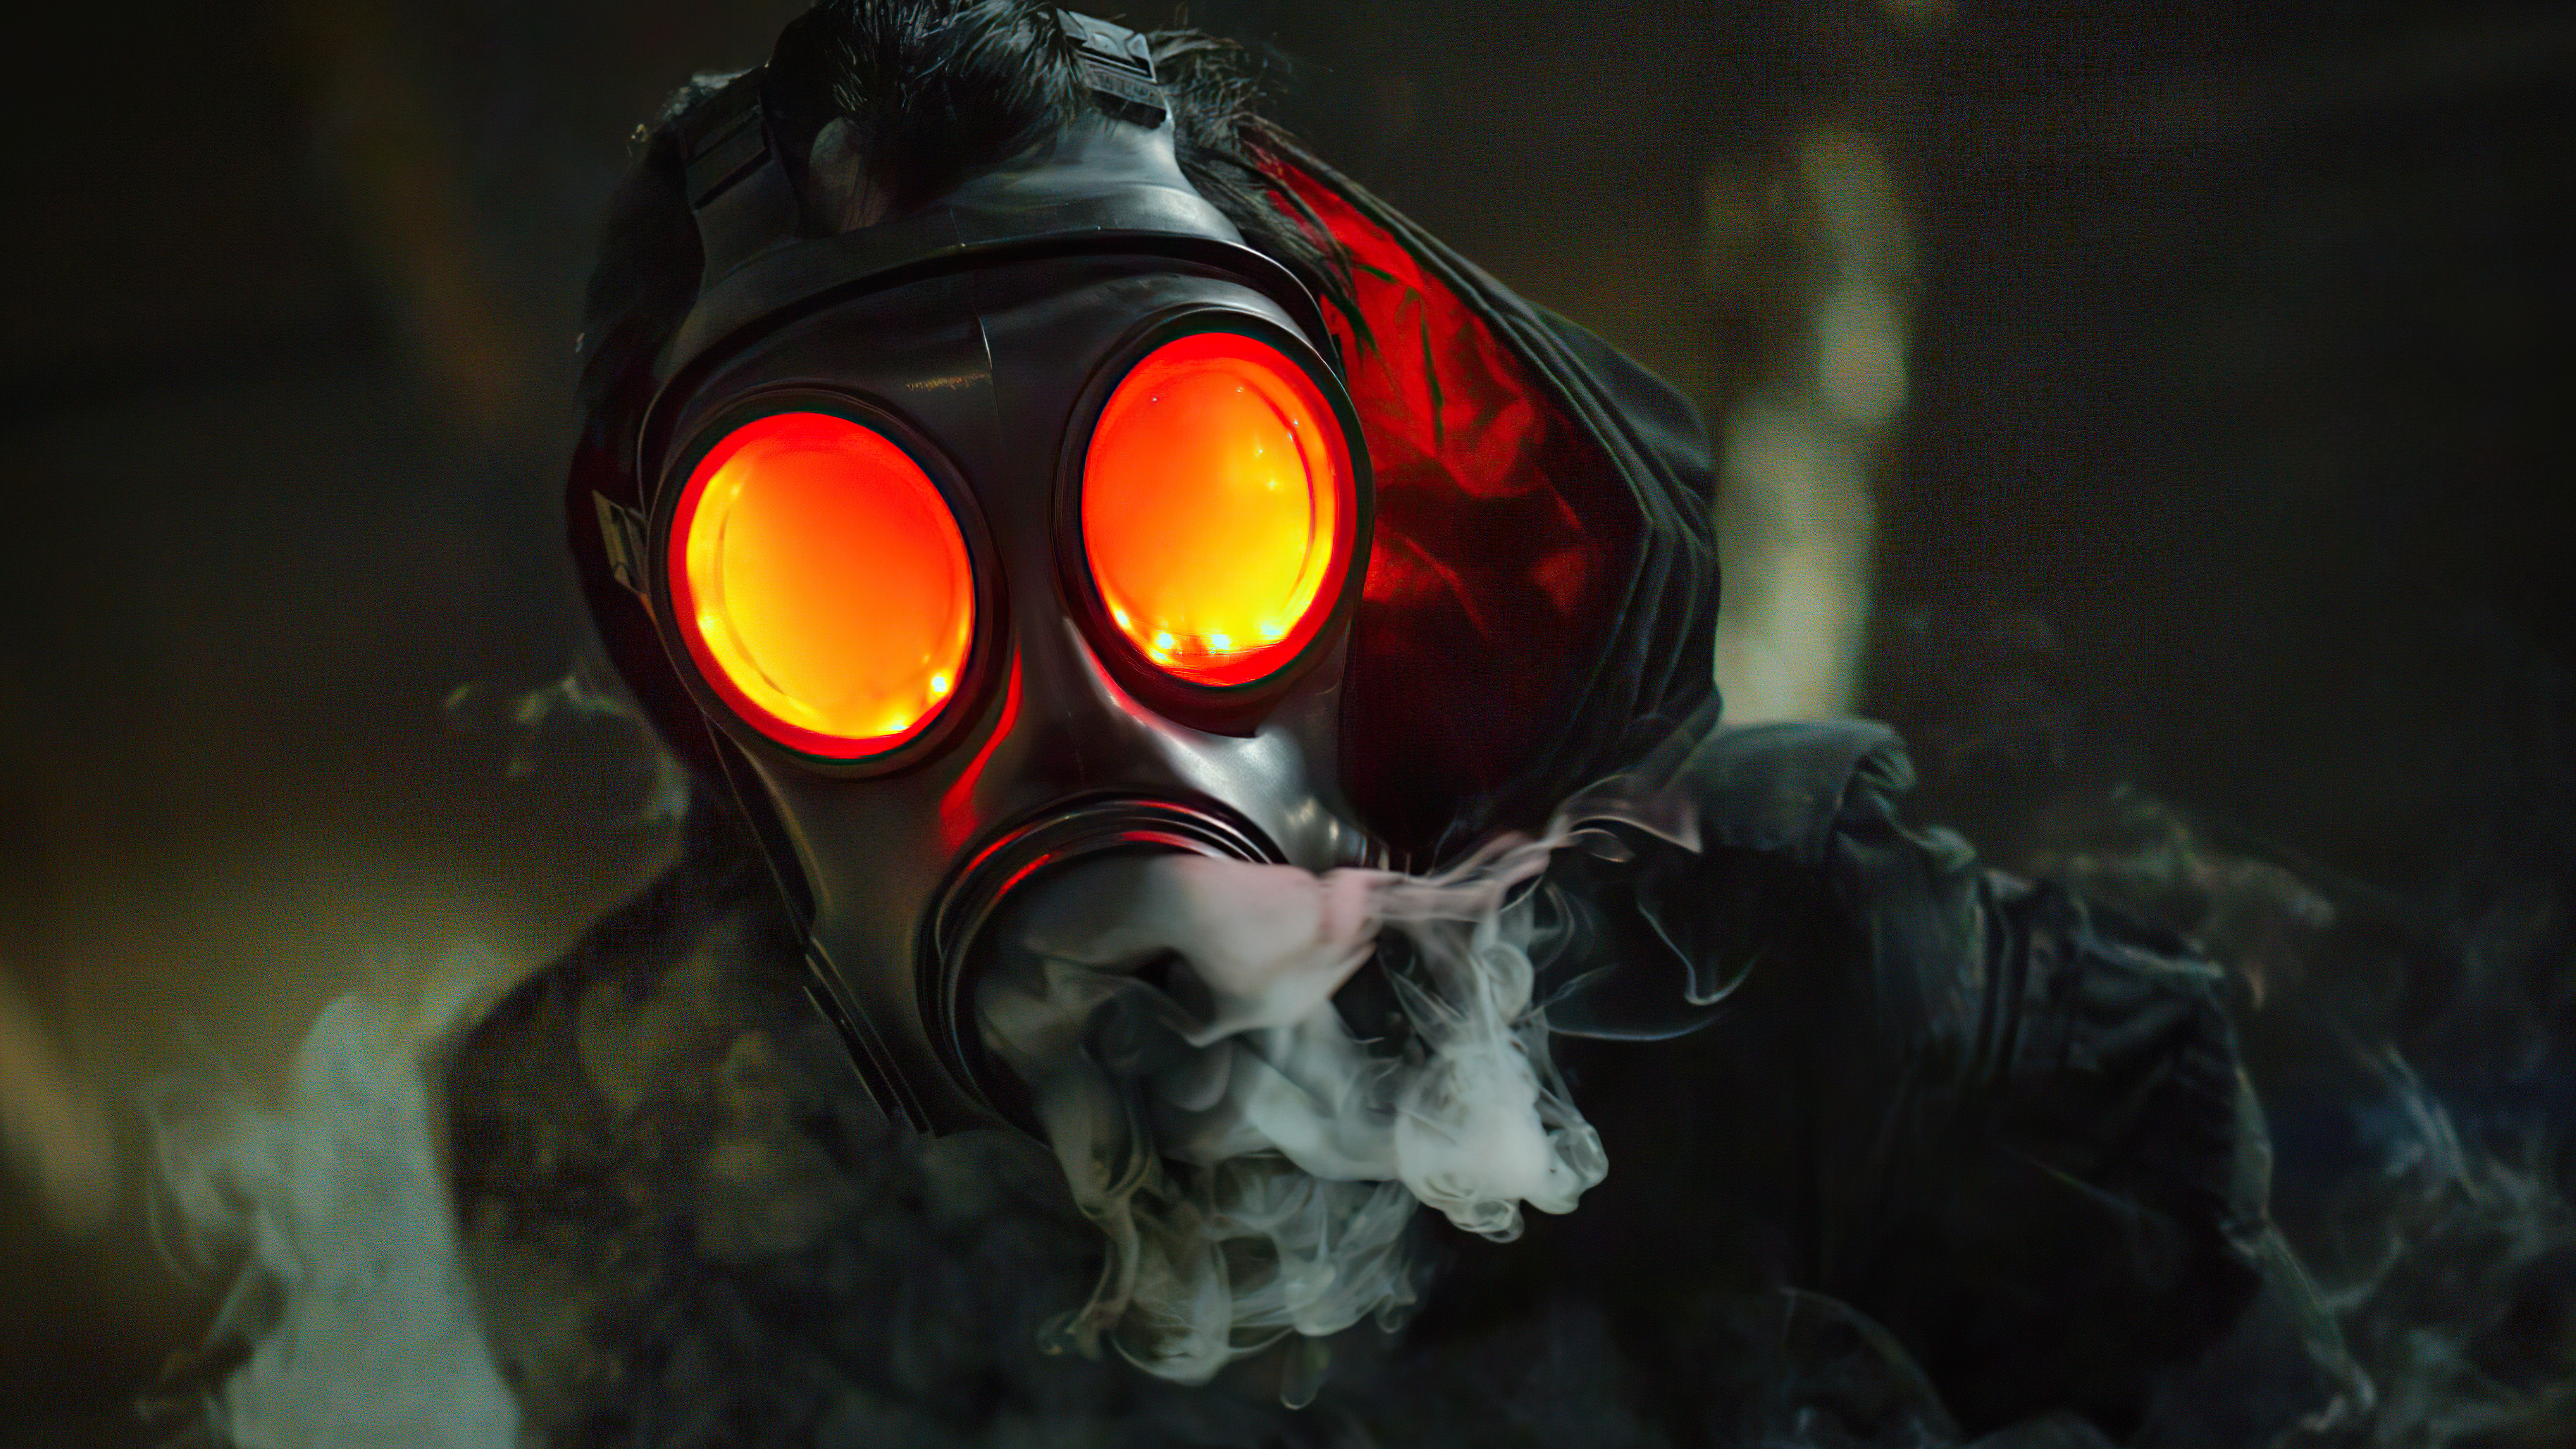 gas mask glowing eyes 4k 1618133345 - Gas Mask Glowing Eyes 4k - Gas Mask Glowing Eyes 4k wallpapers